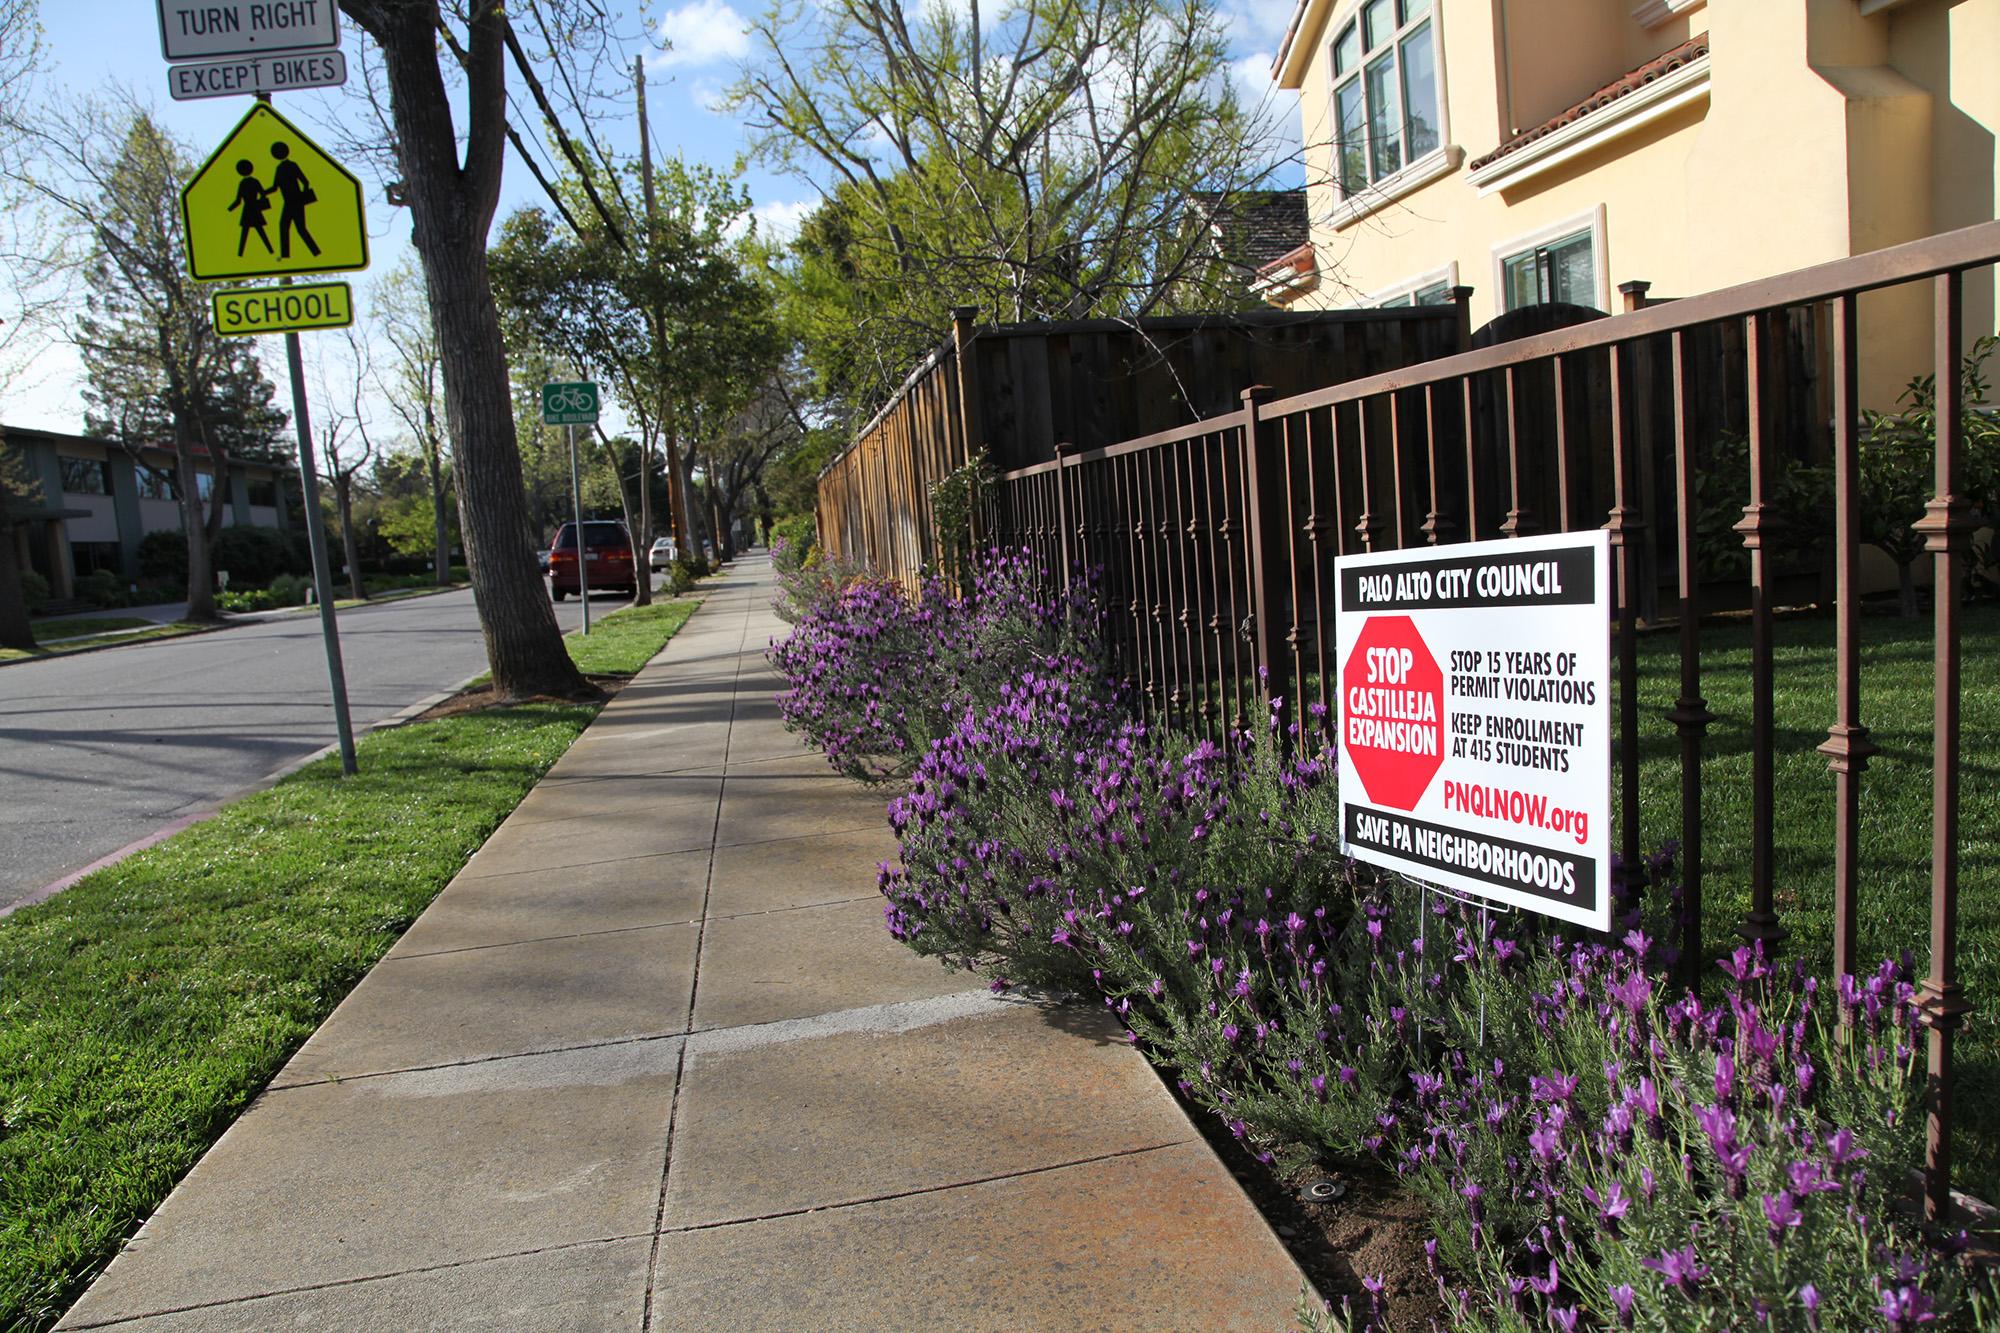 castilleja school misleads neighborhood